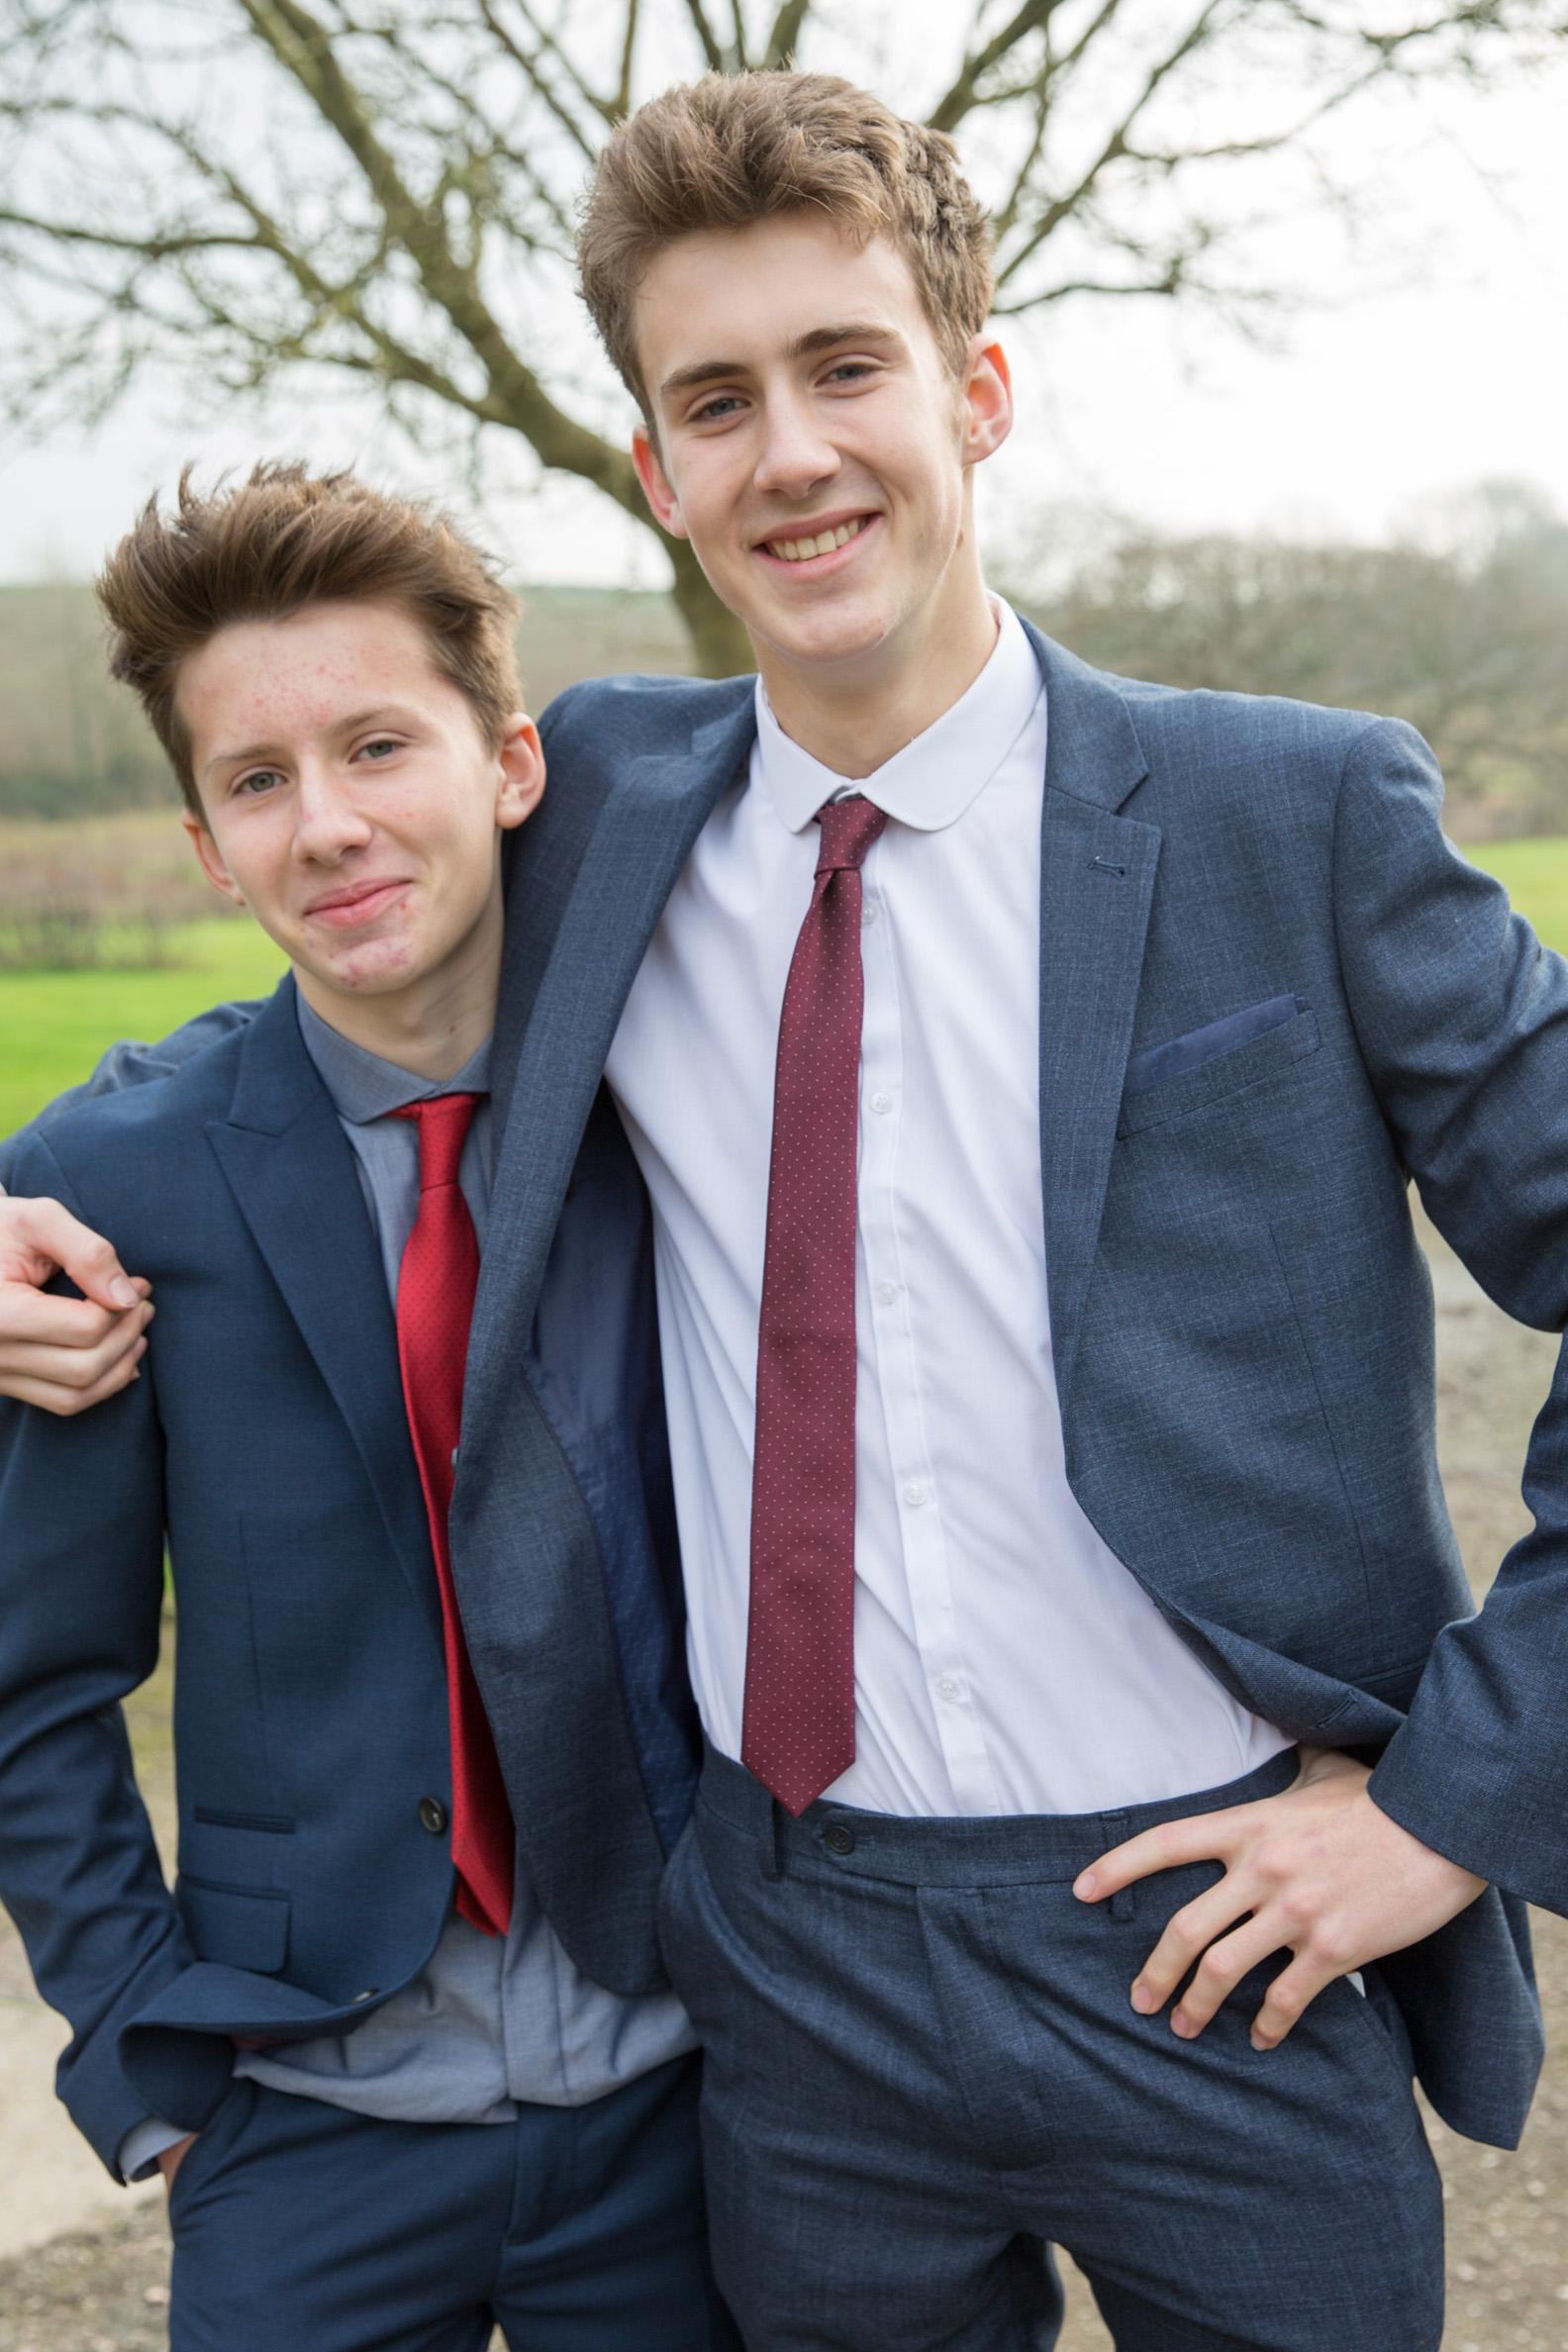 Jess & Ben - Bristol Wedding Photographer - Wright Wedding Photography - 91